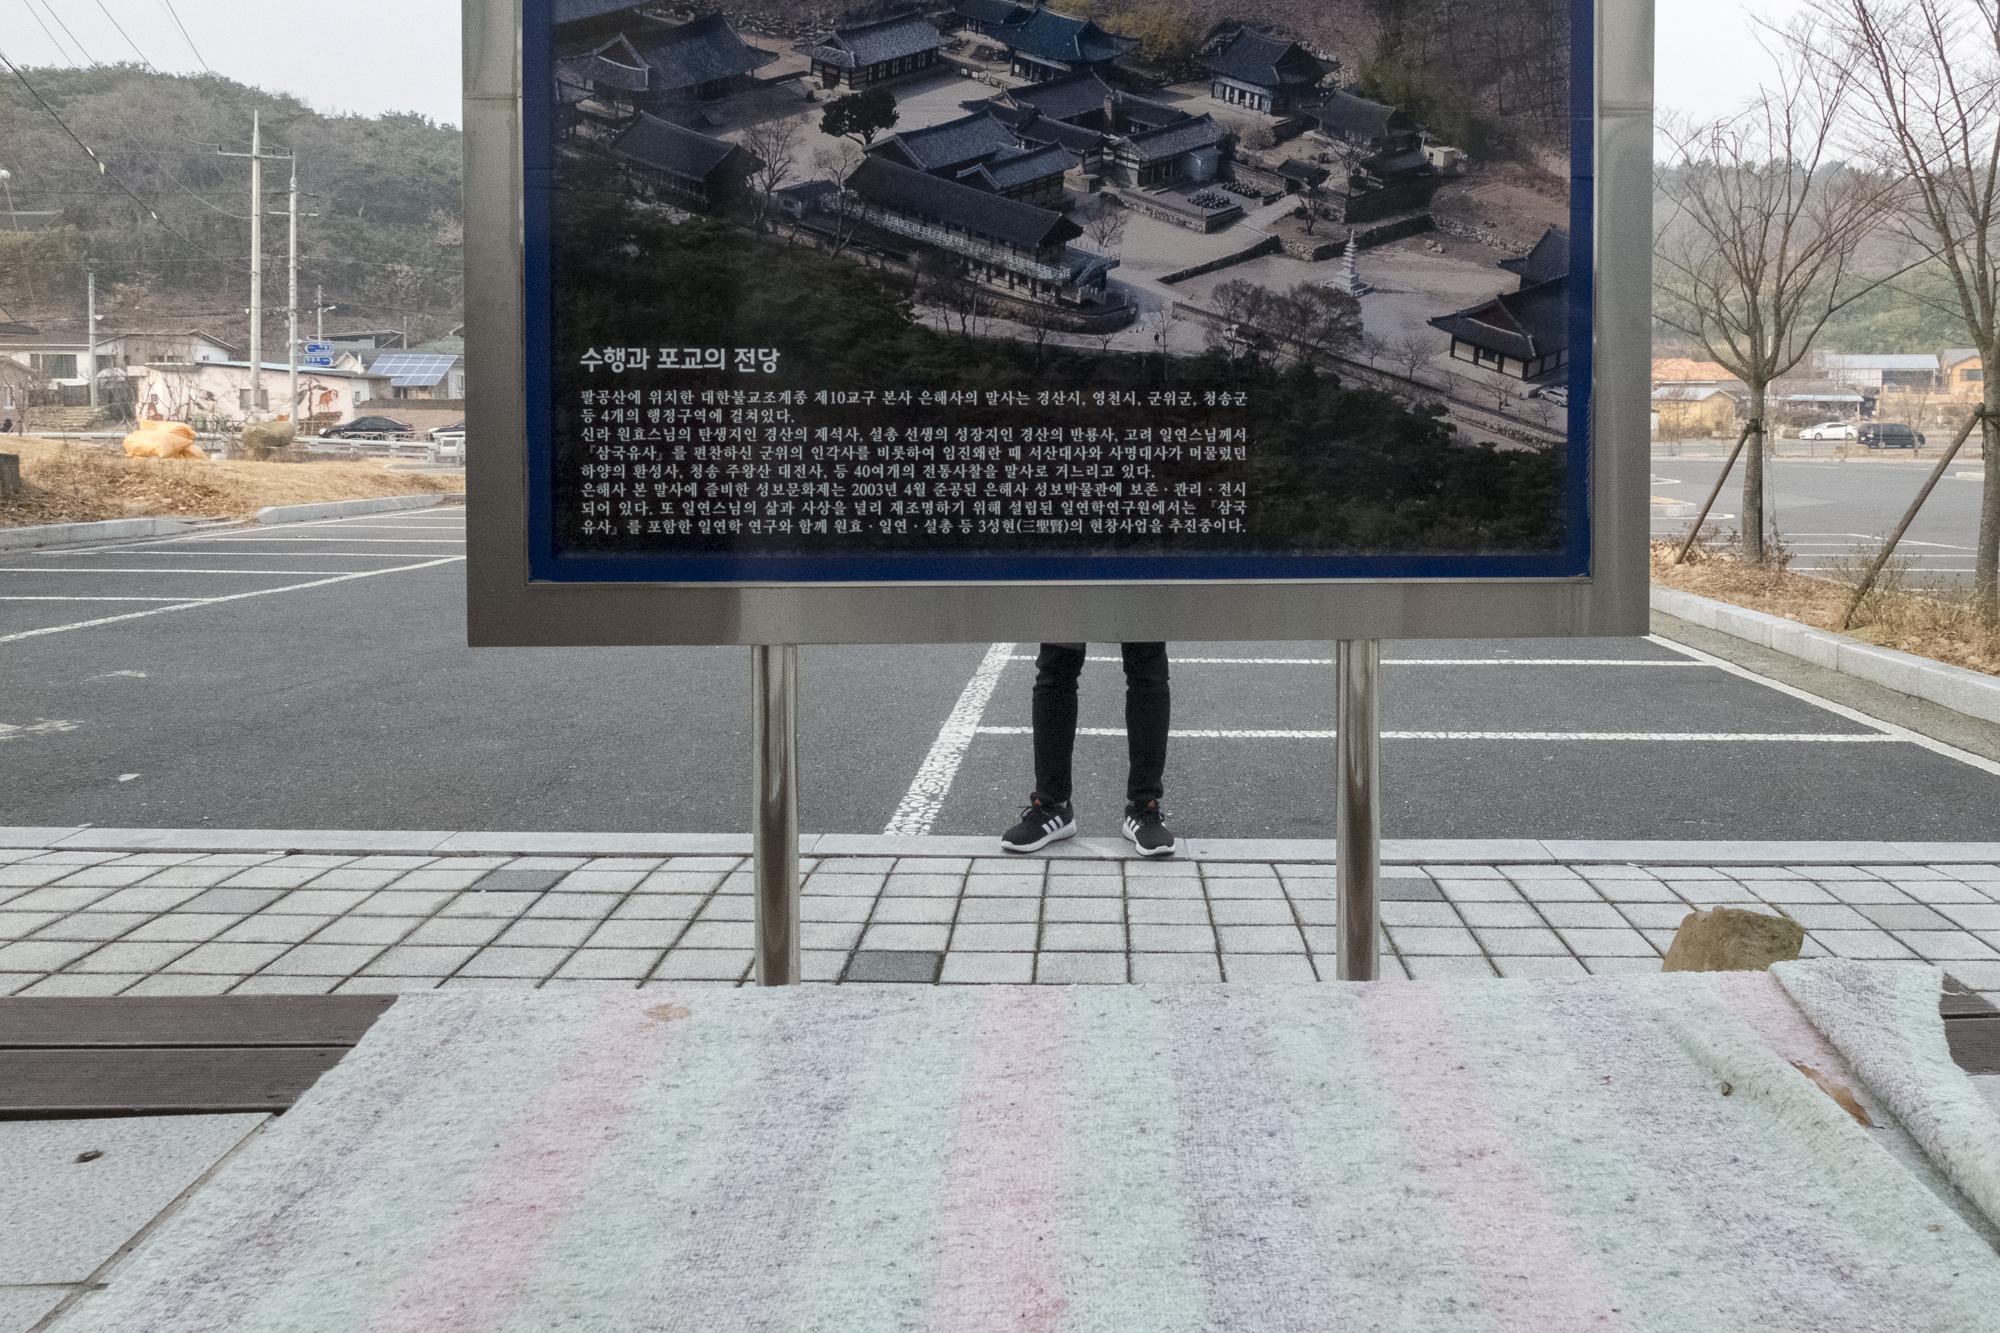 South_Korea_2017-2018-33.JPG